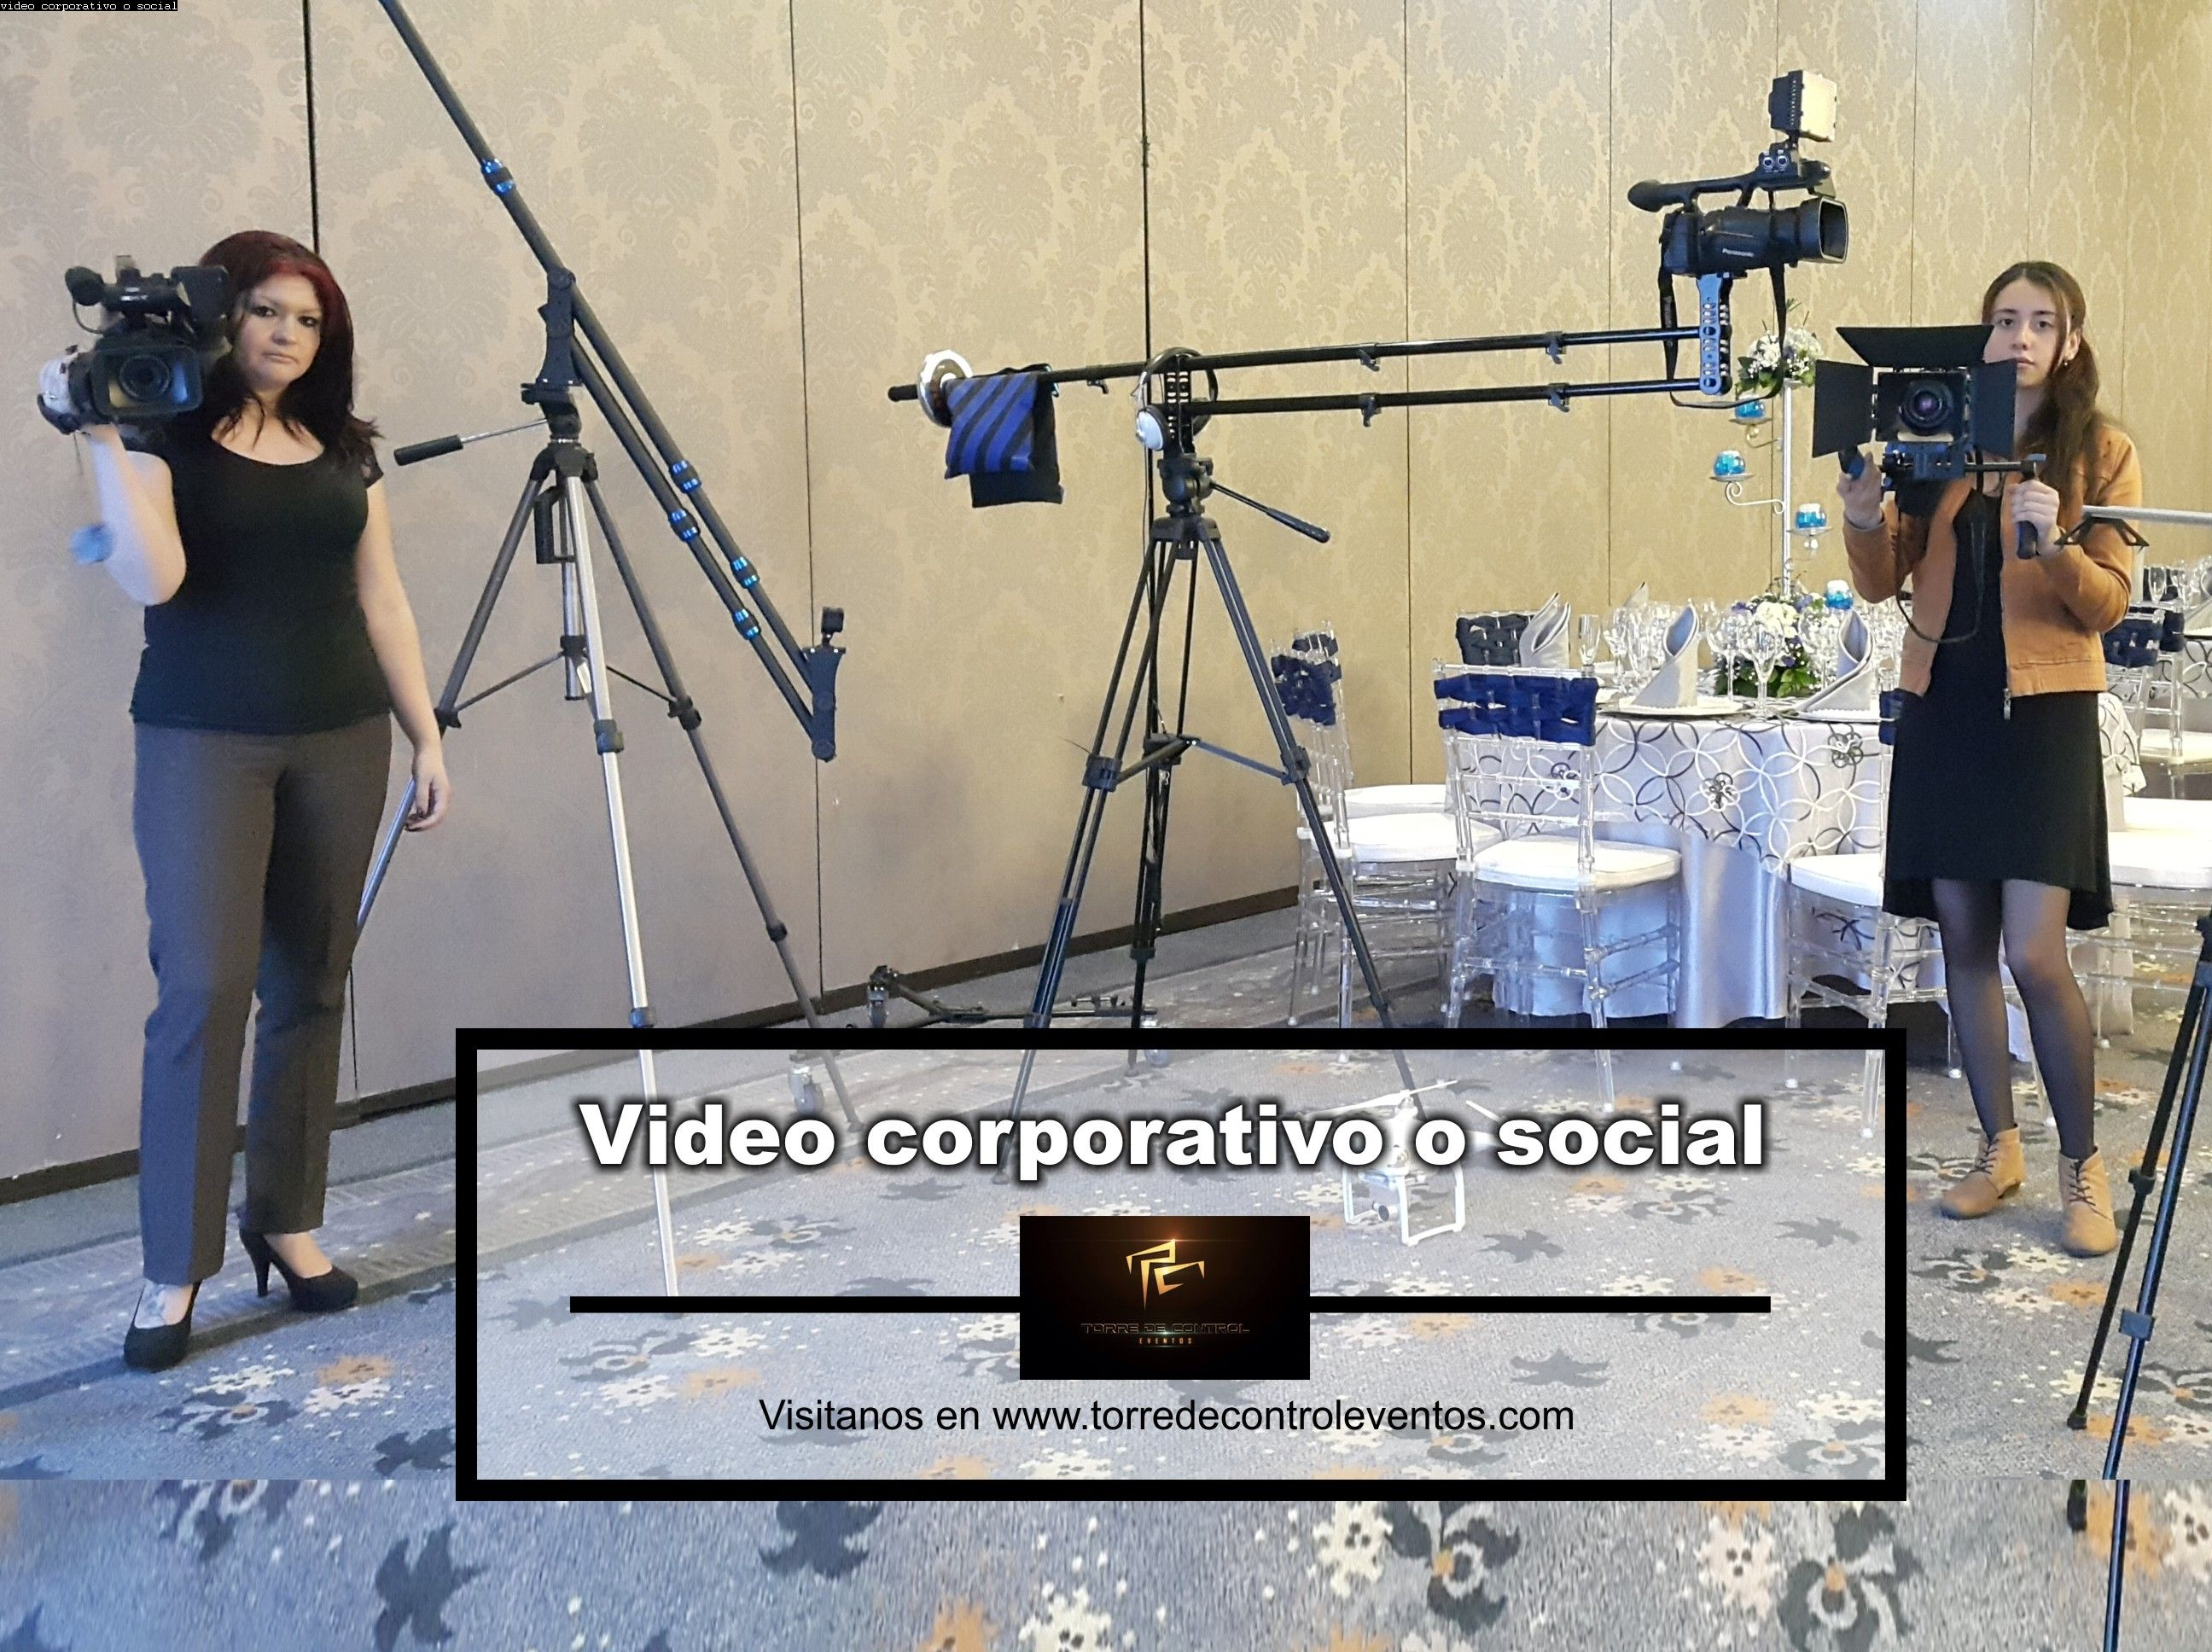 video corporativo o social